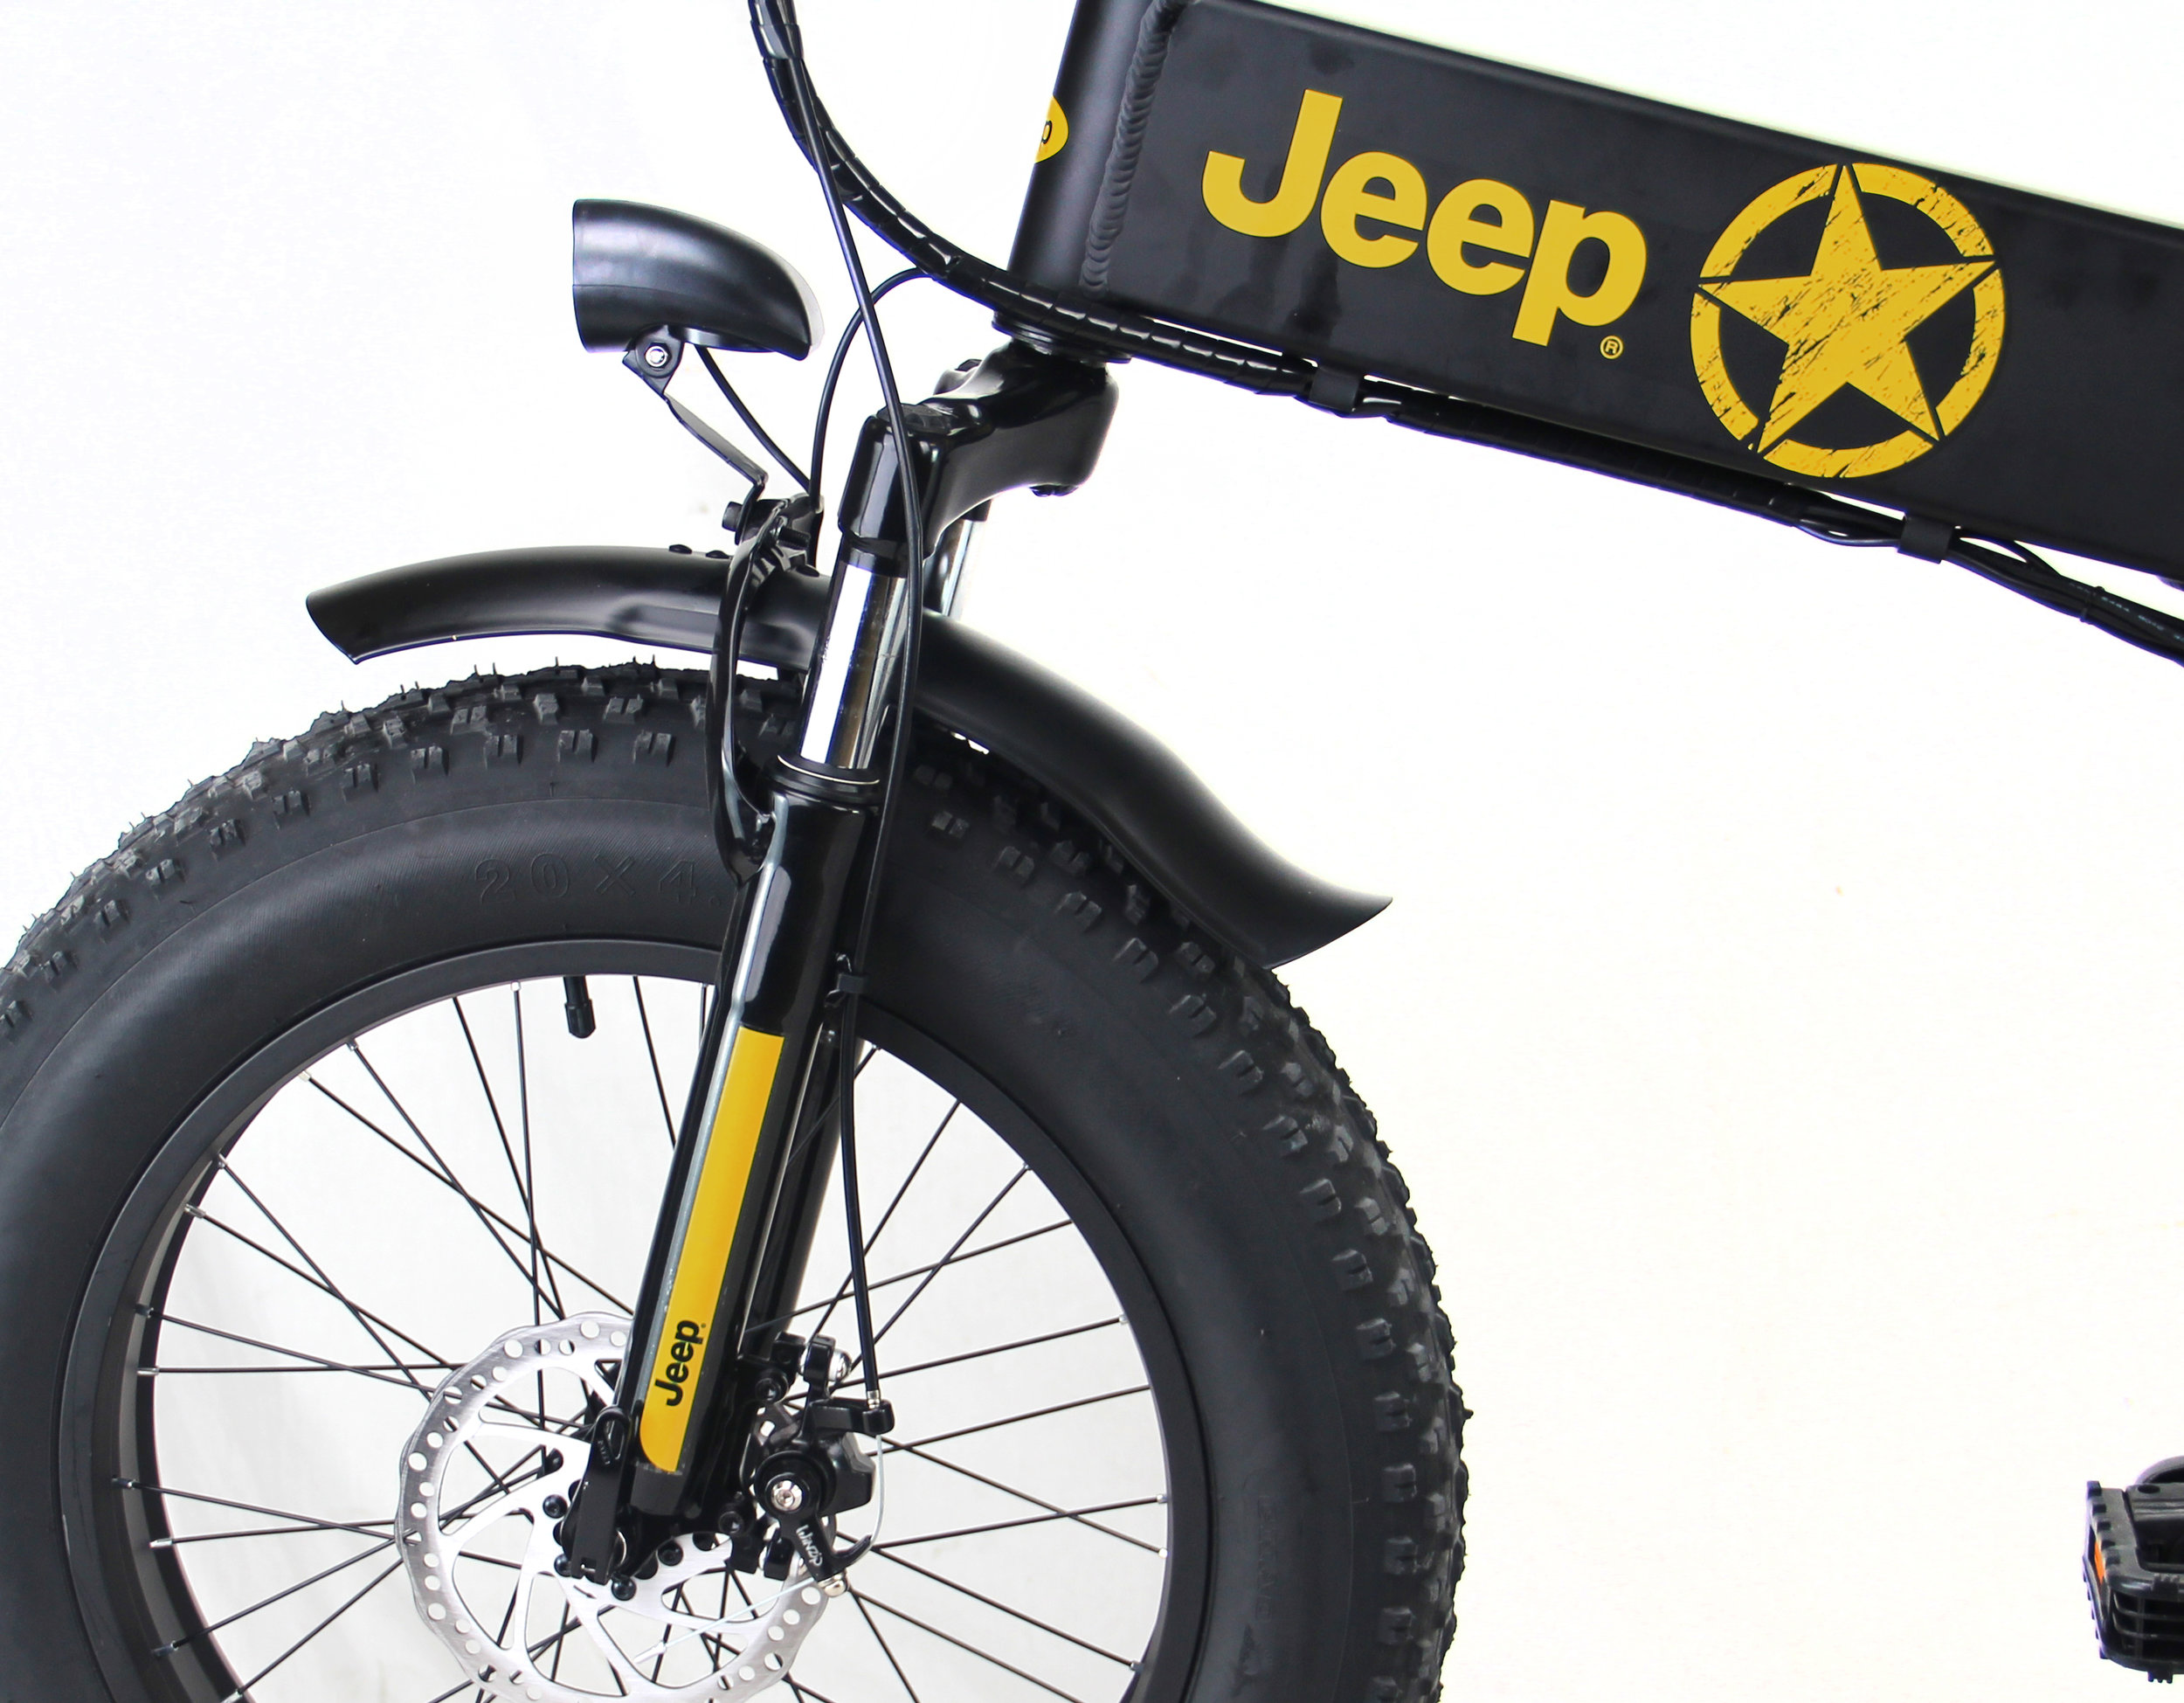 jeep detail.jpg